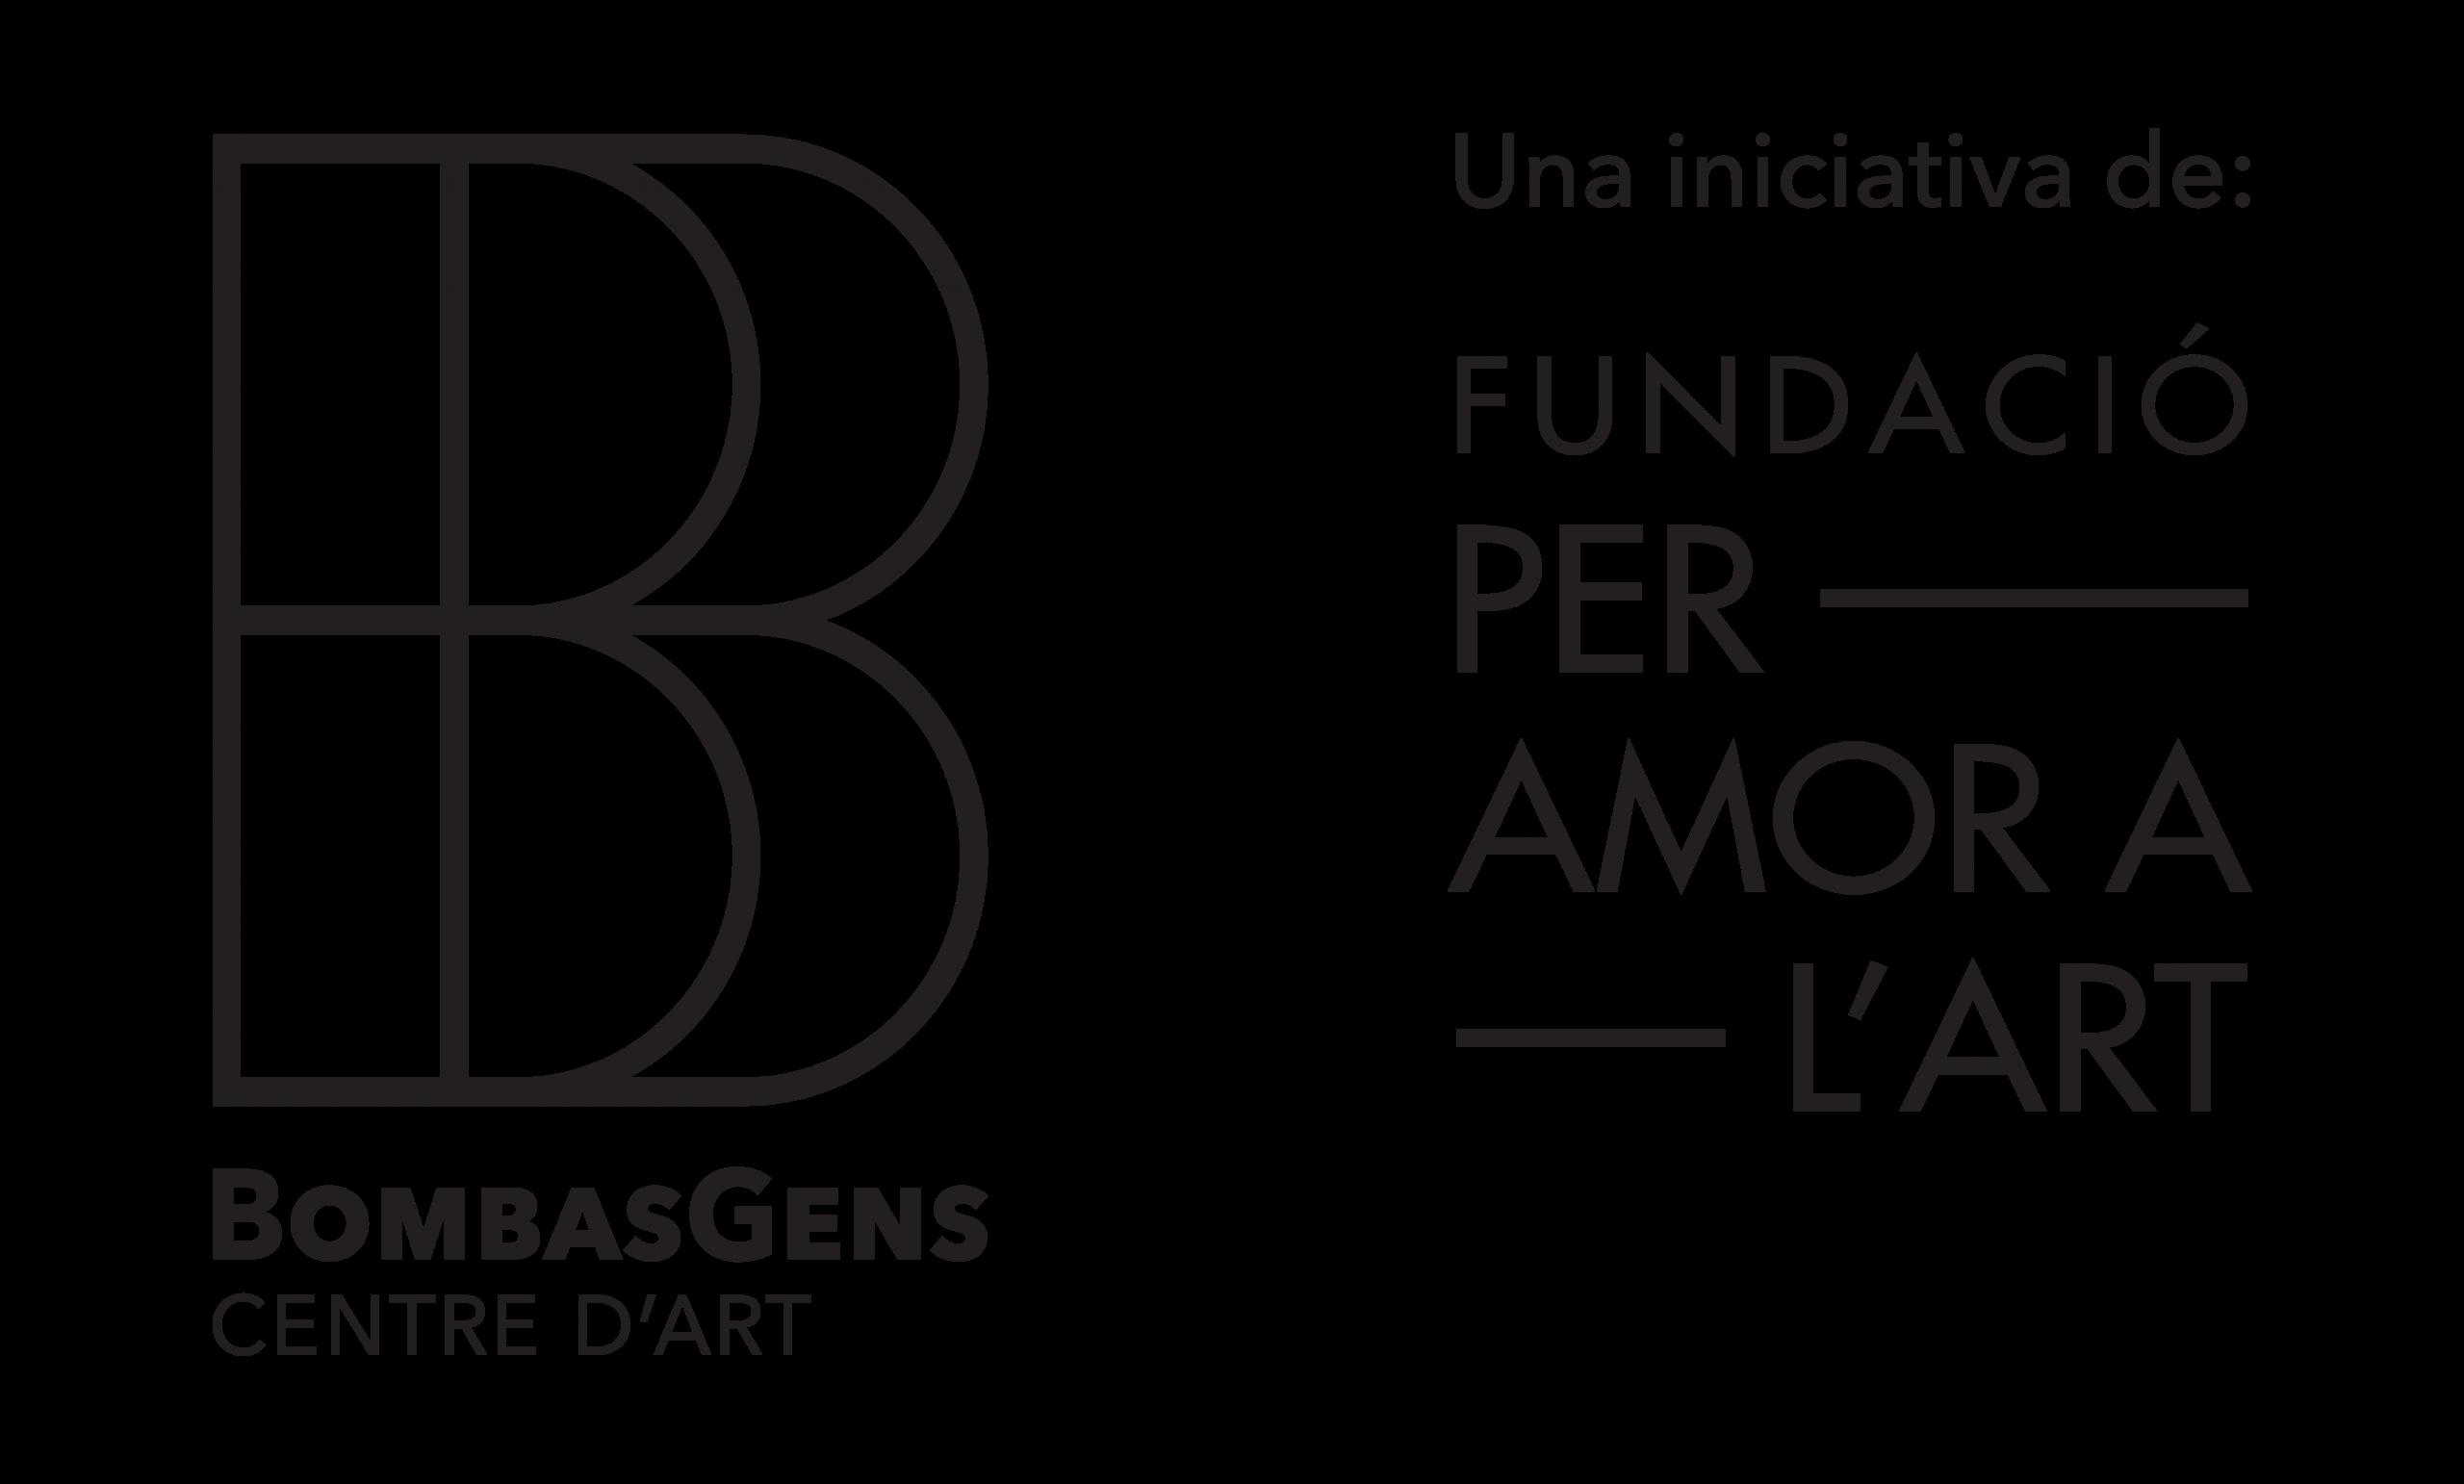 Bombas Gens & Ricard Camarena